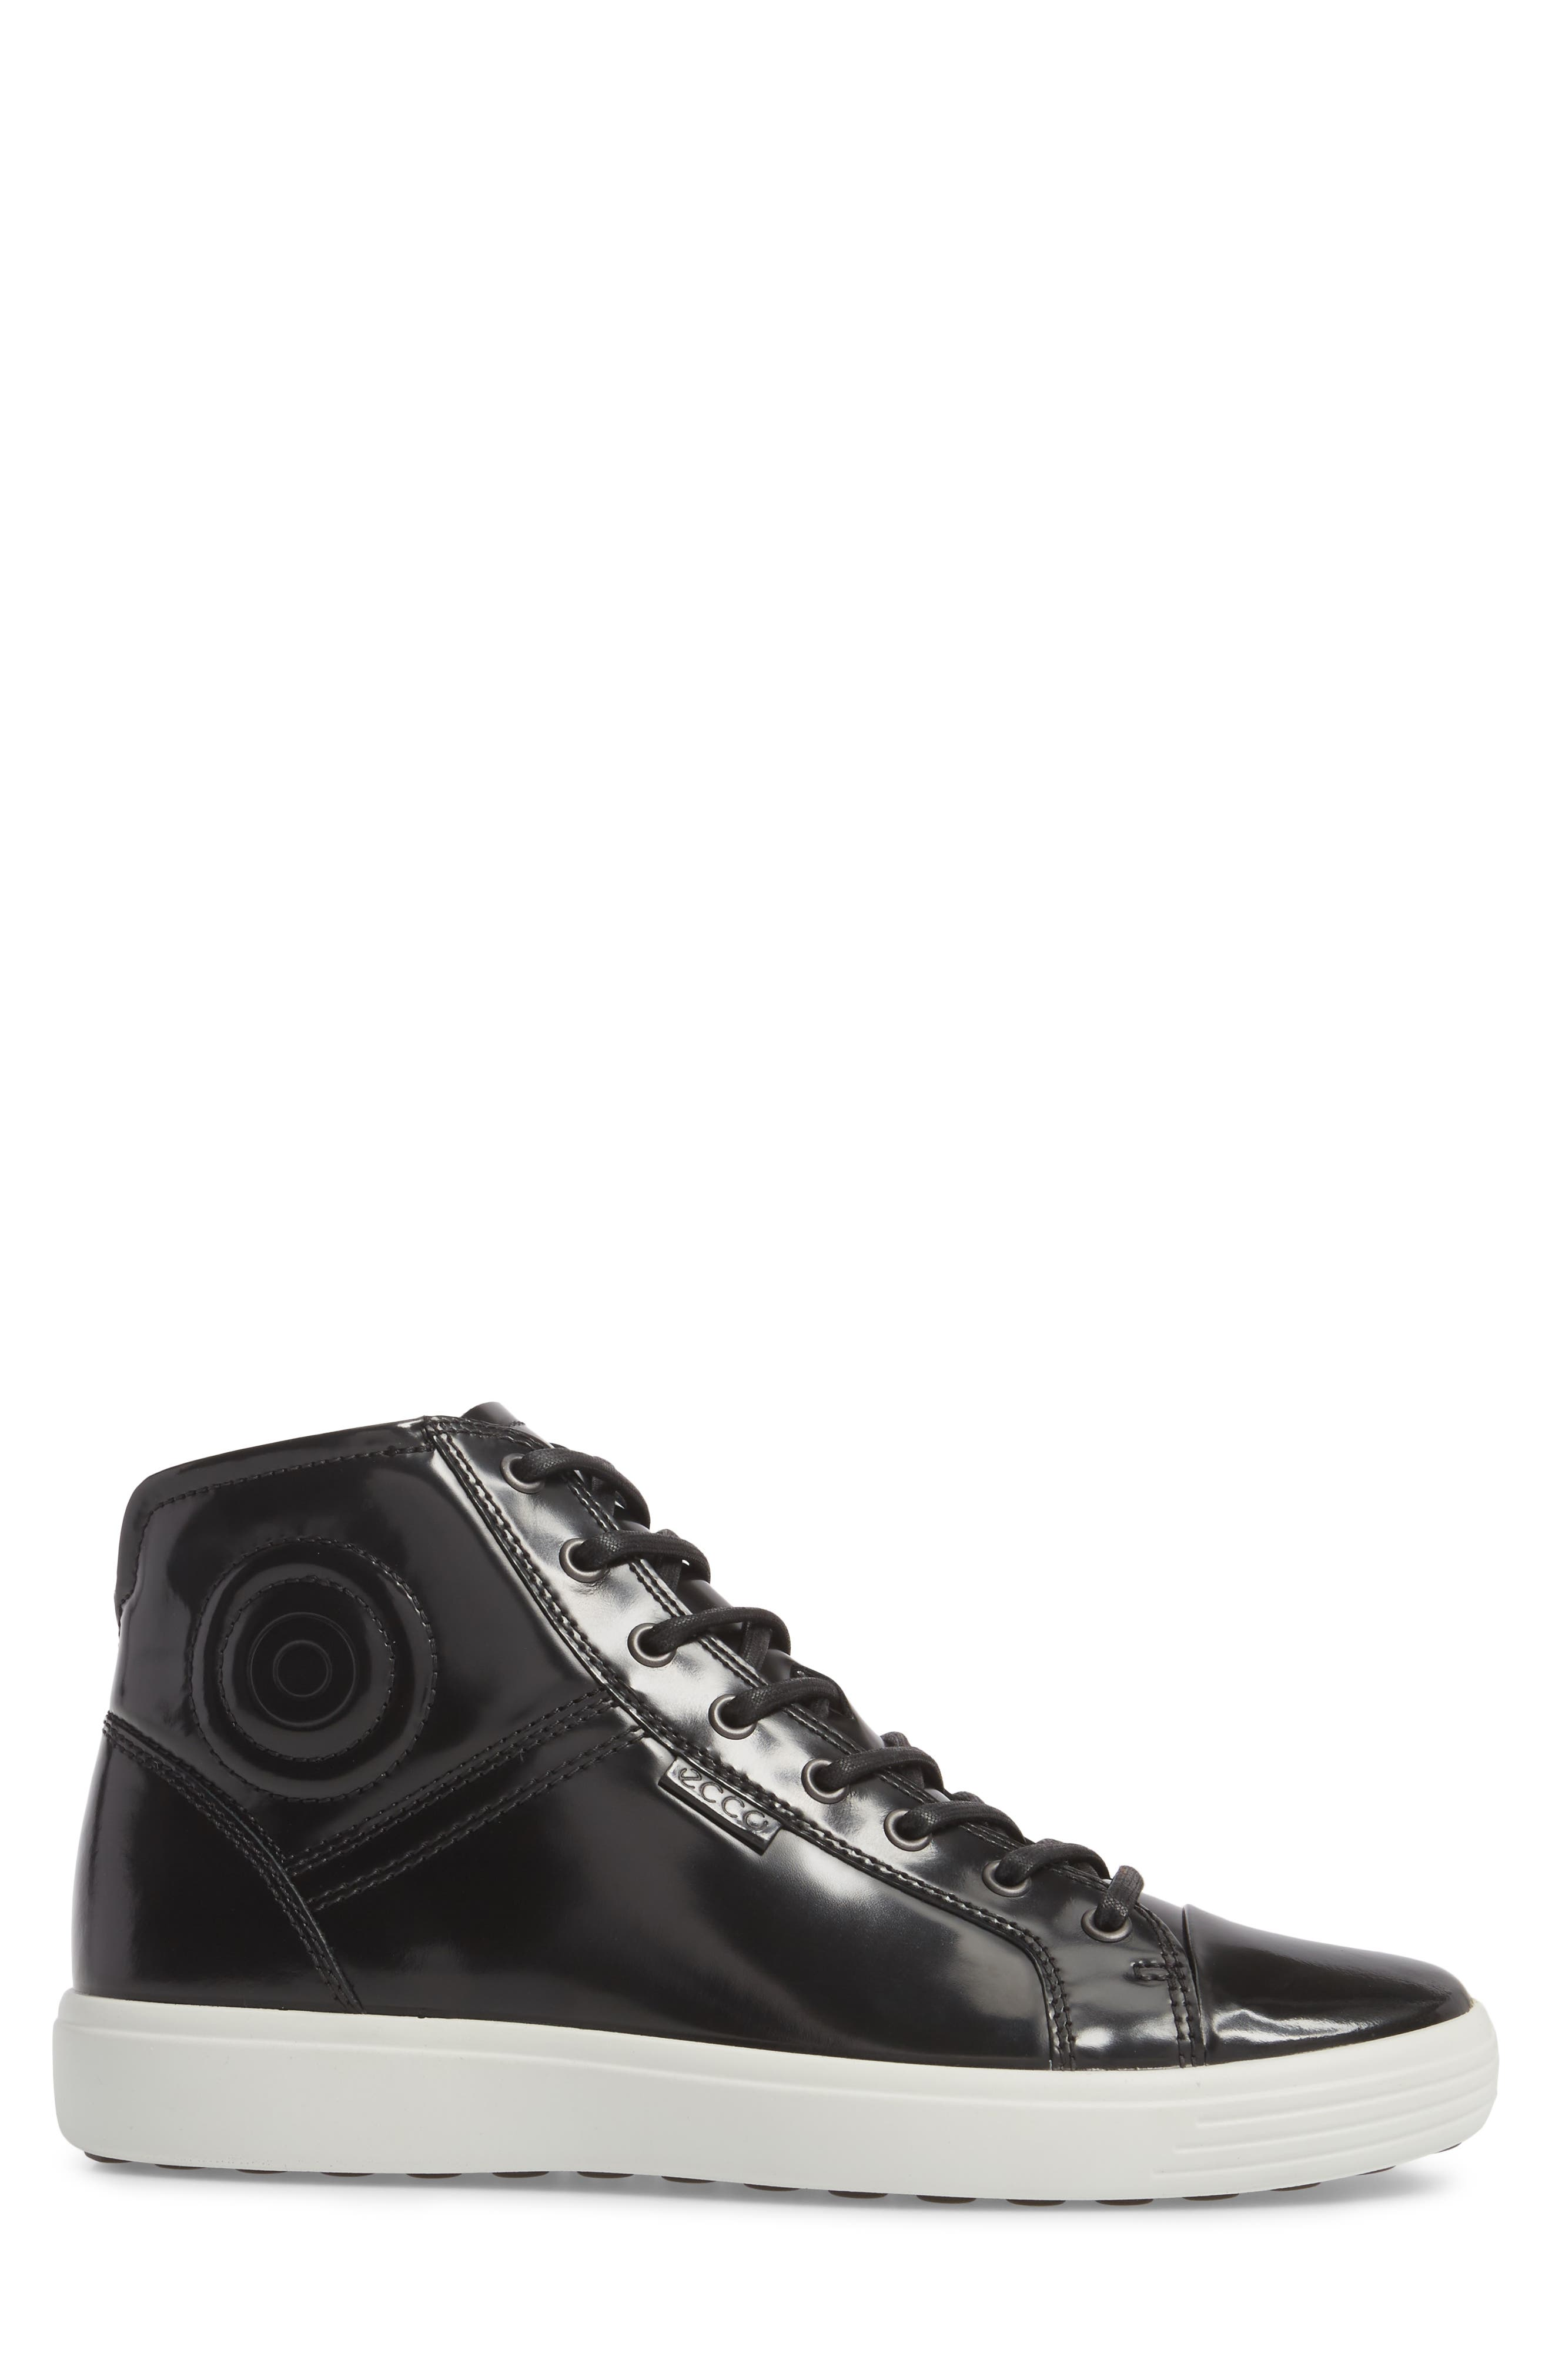 Soft 7 Premium High Top Sneaker,                             Alternate thumbnail 3, color,                             009